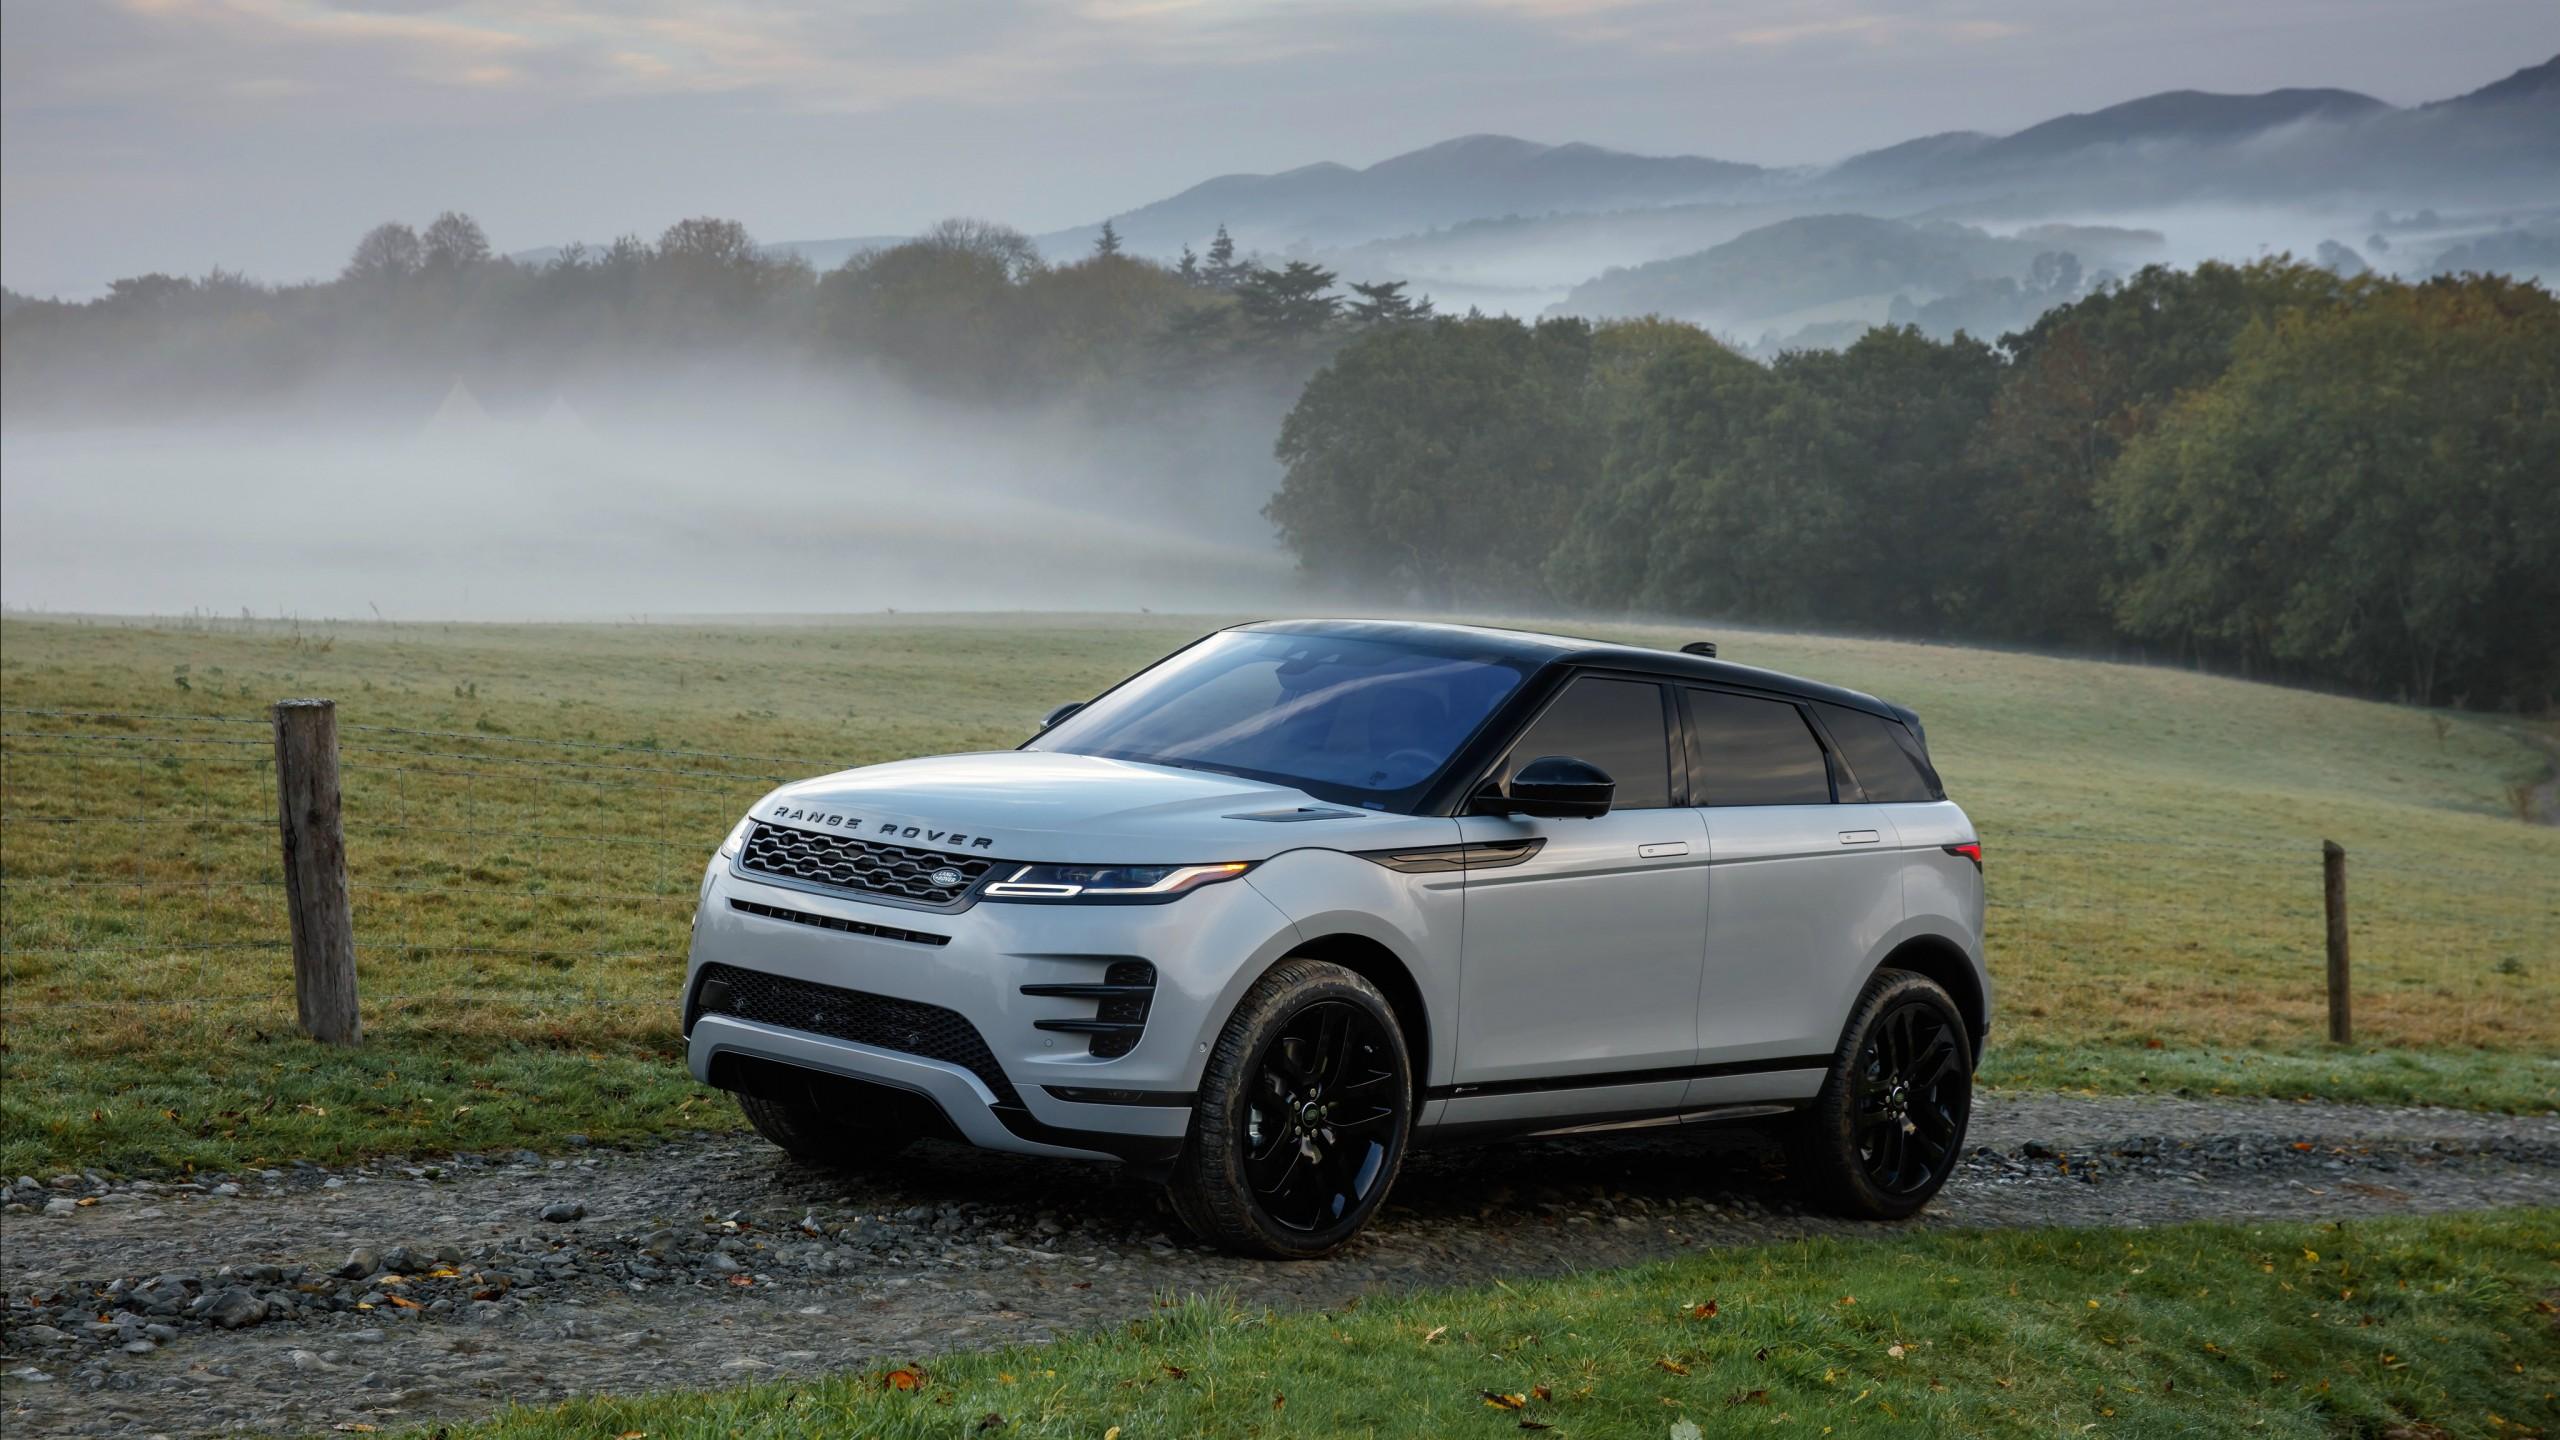 Wallpaper Range Rover Evoque, SUV, 2019 Cars, 4K, Cars ...